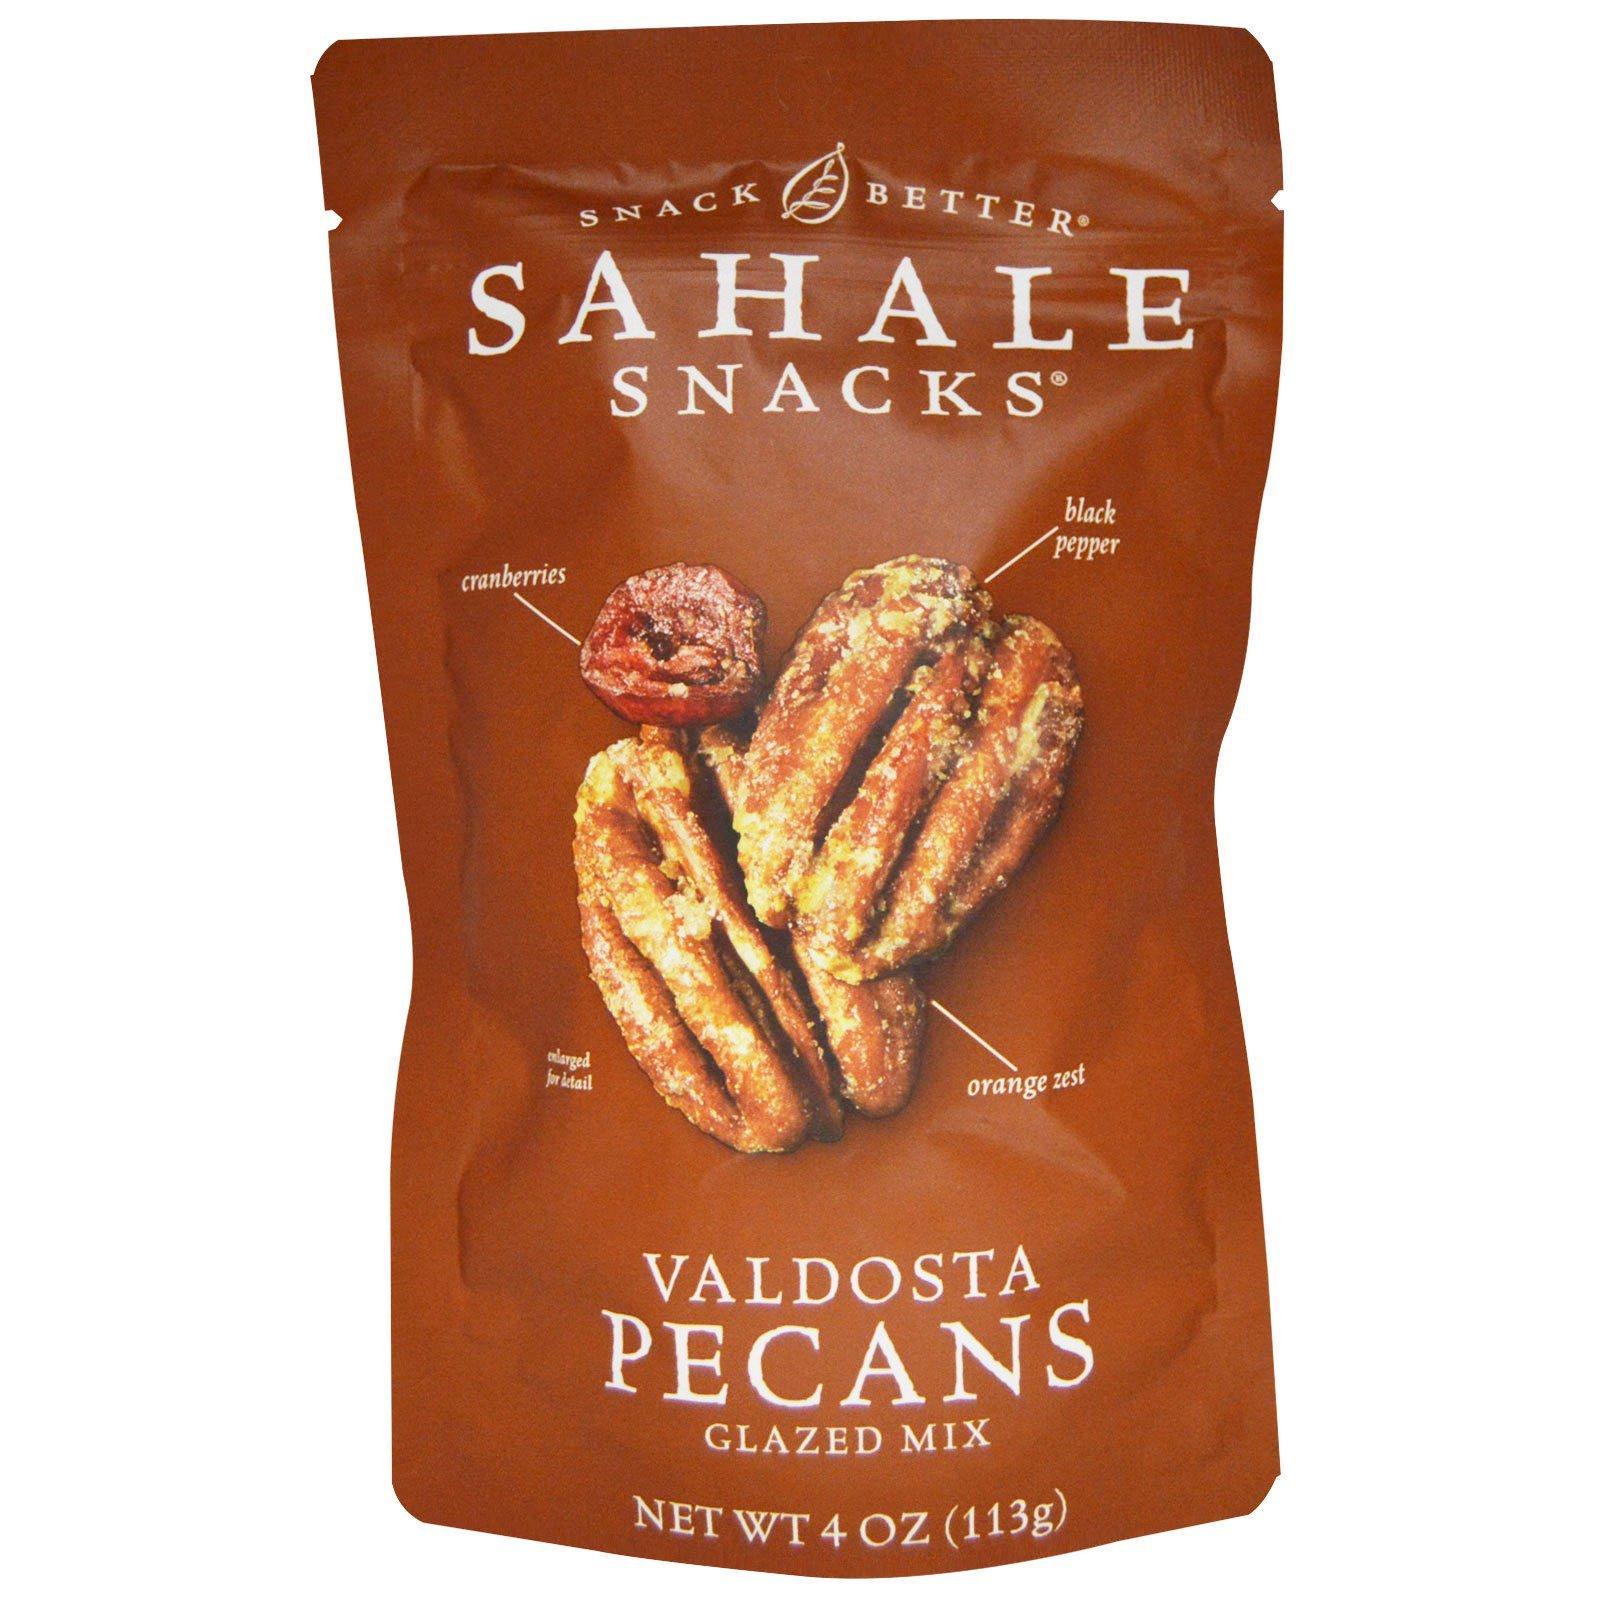 Sahale snacks glazed mix valdosta pecans 4 oz 113 g iherb sahale snacks glazed mix valdosta pecans 4 oz 113 g publicscrutiny Choice Image